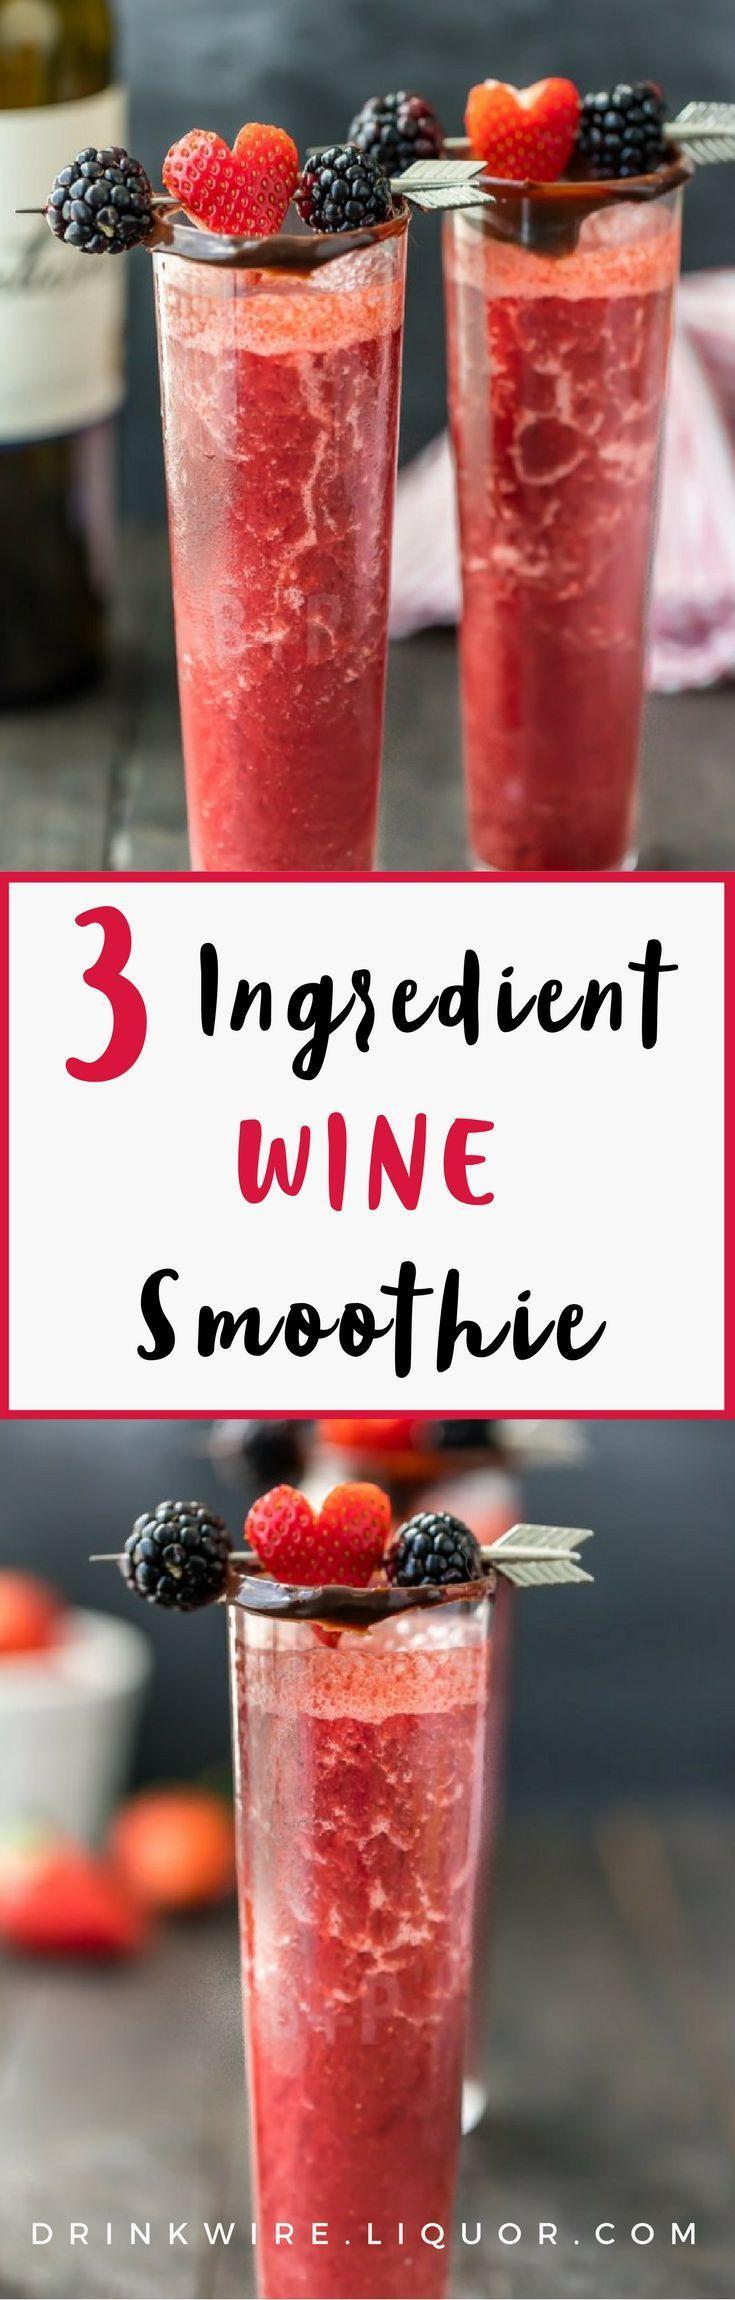 Wedding - 3 Ingredient Chocolate Covered Strawberry Wine Smoothie